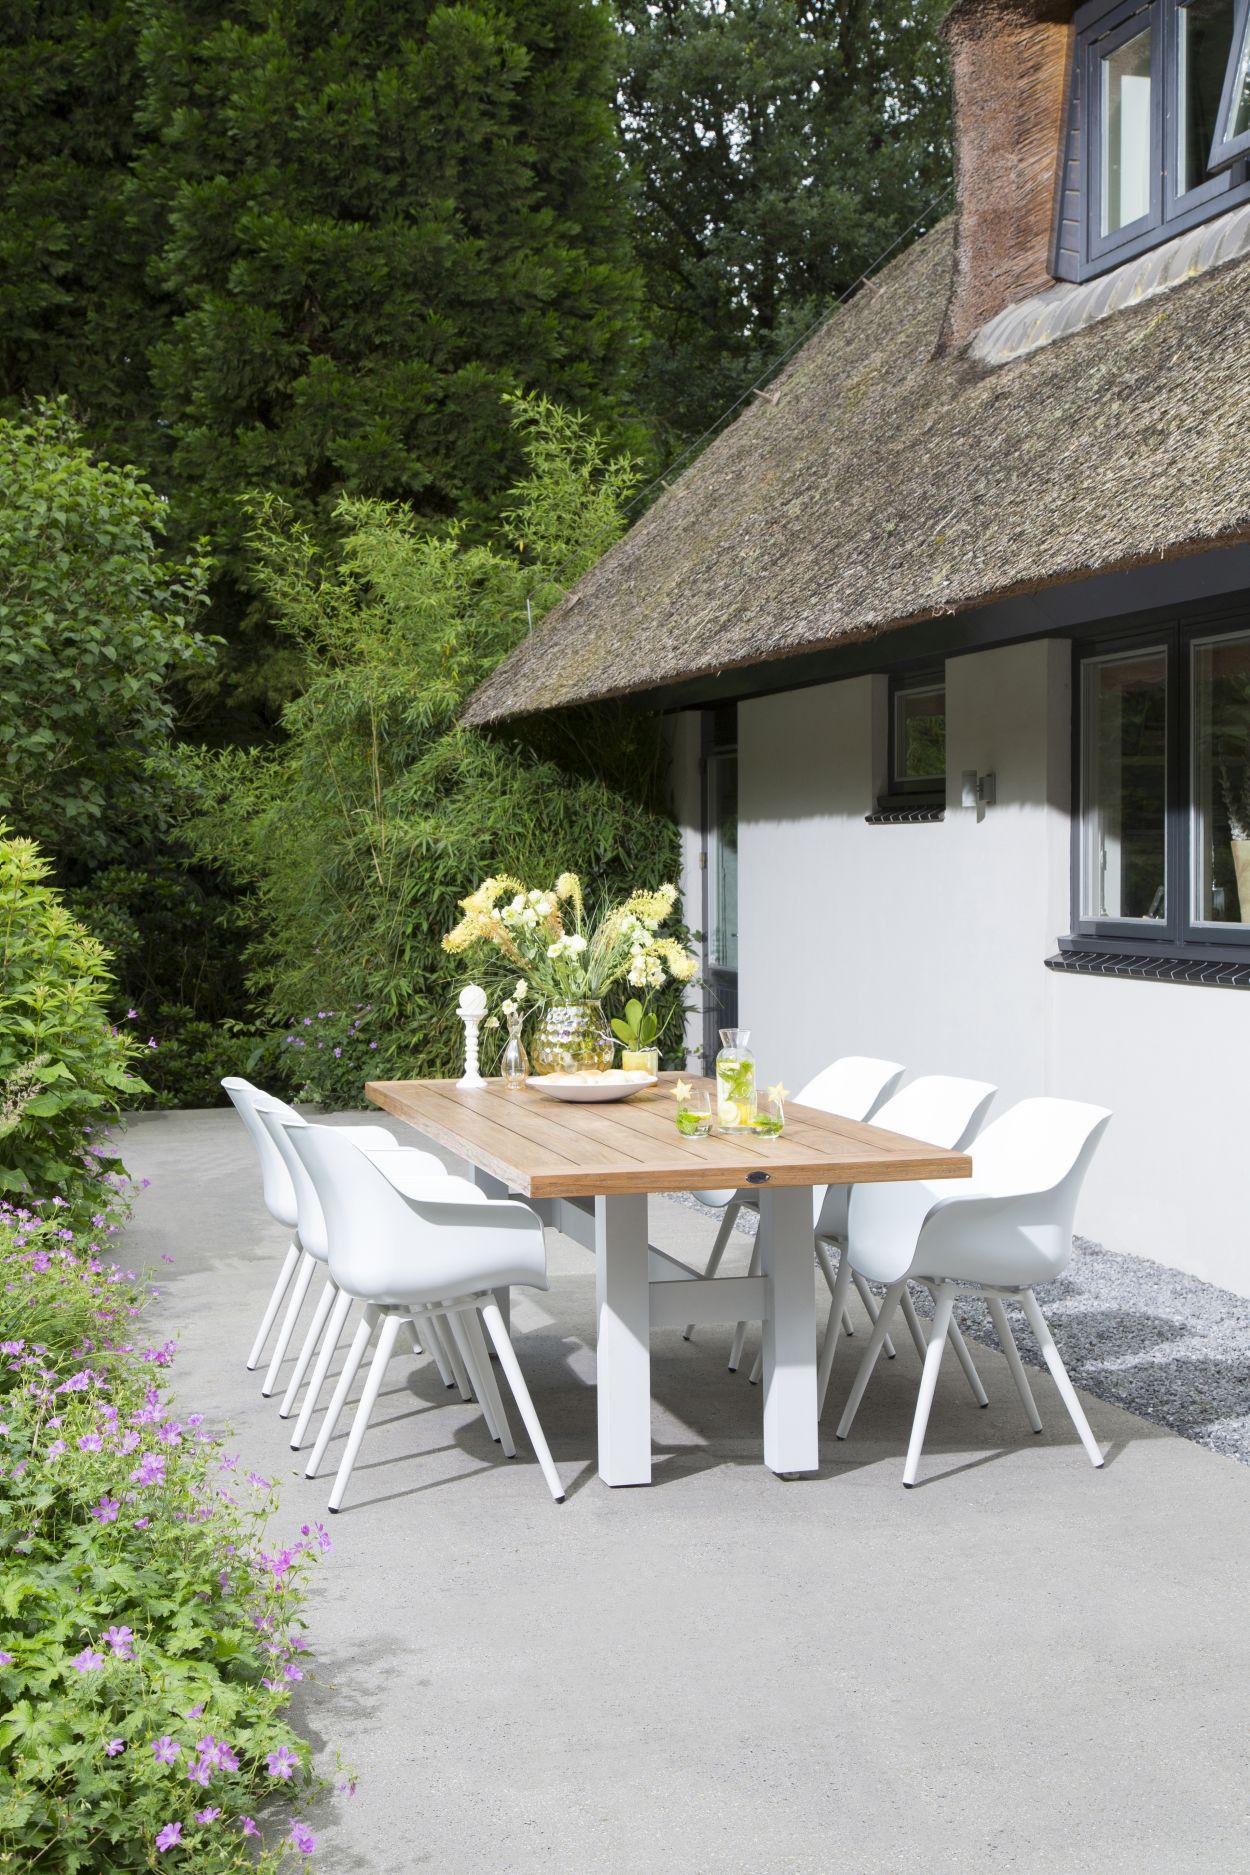 2 Hartman Tuinstoelen.Hartman Sophie Studio Dining Tuinstoel Armleuning Set Van 2 Wit